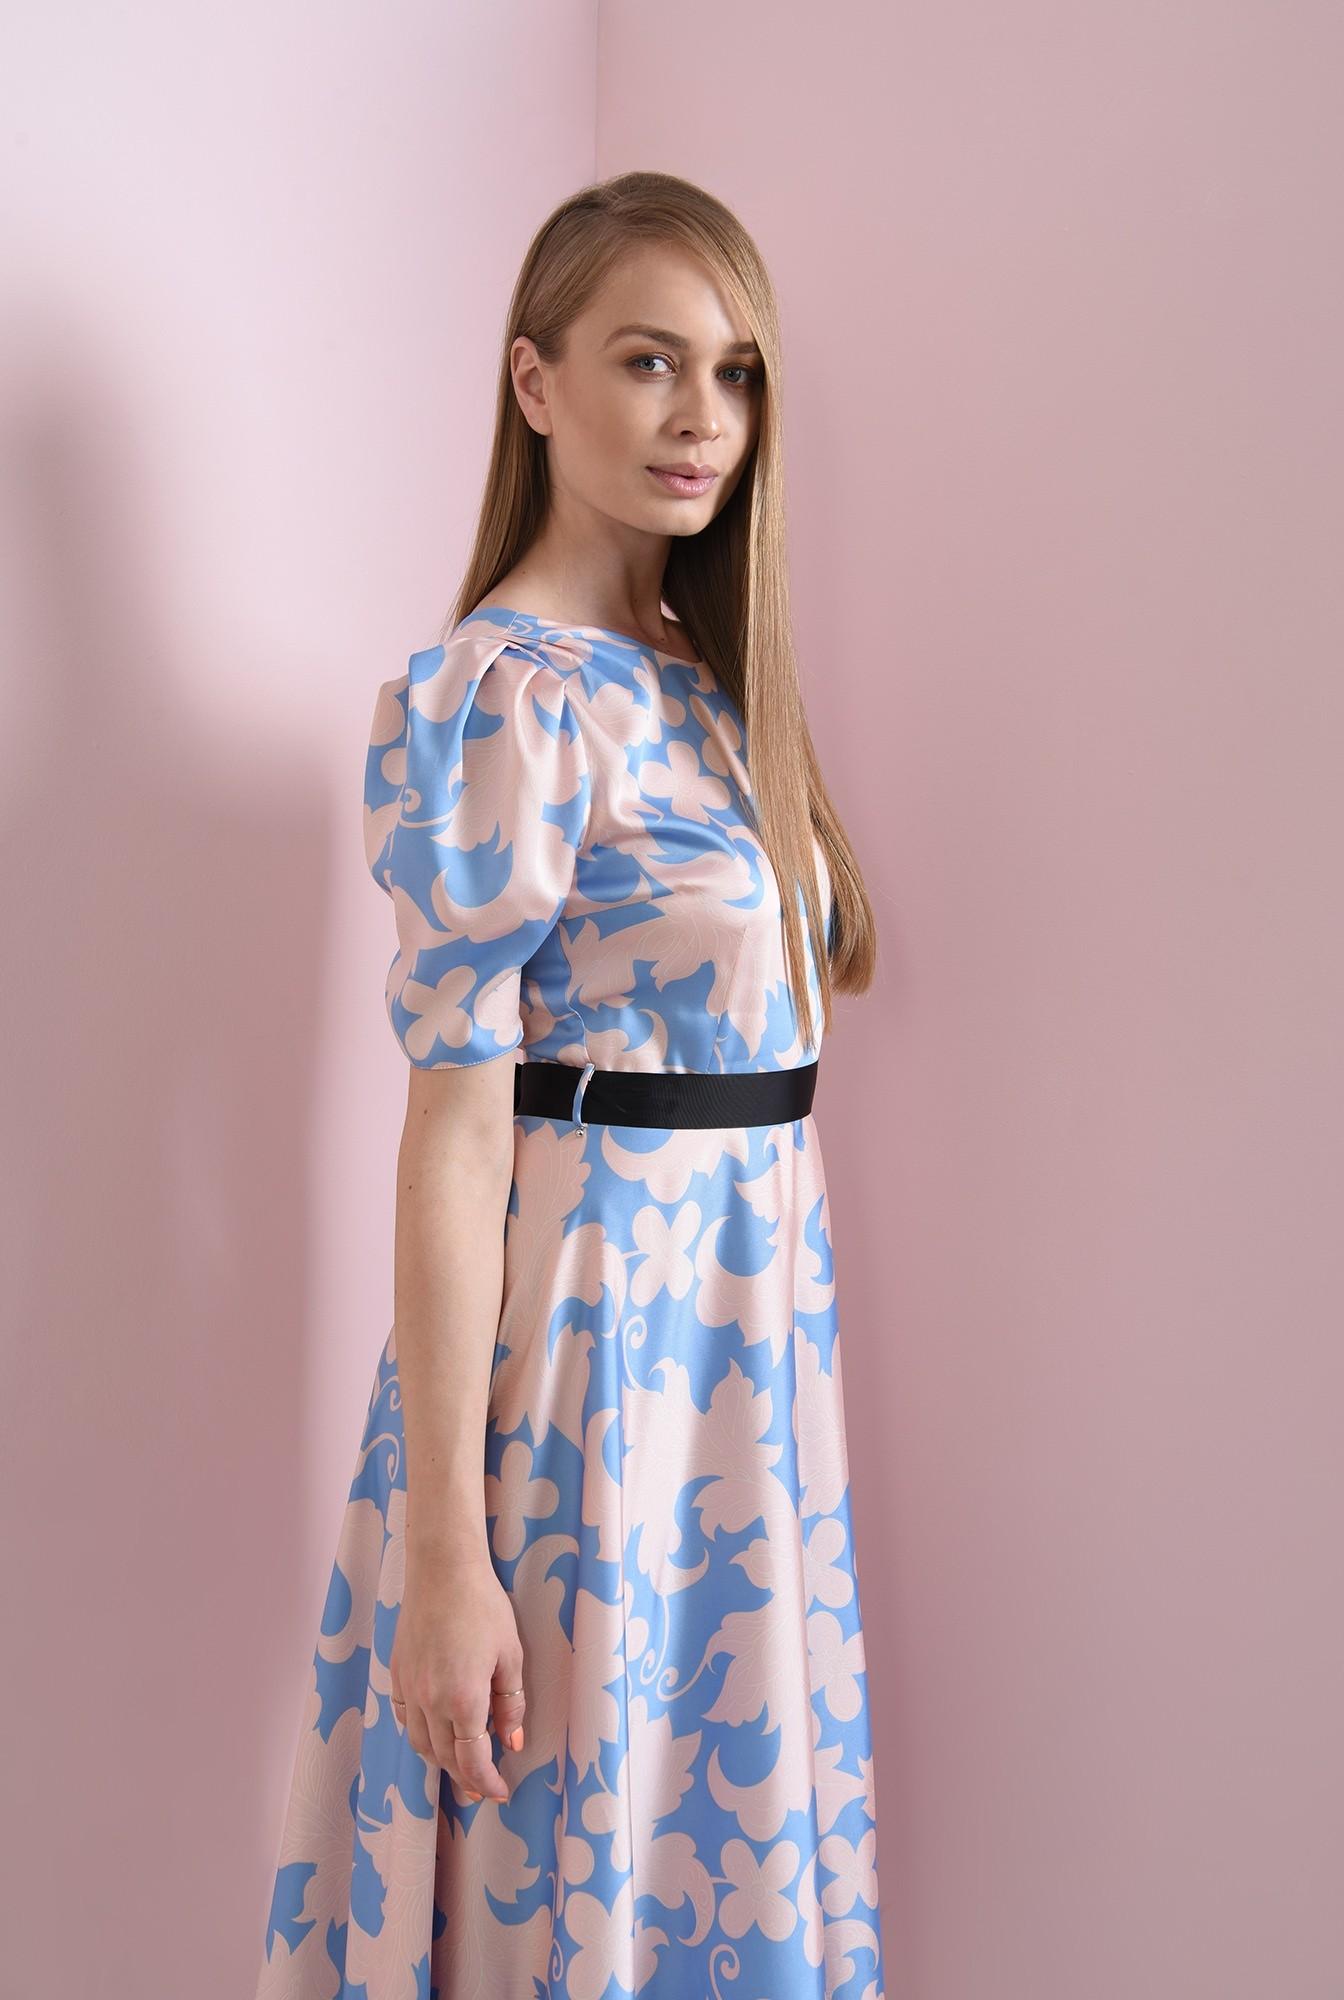 2 - rochie evazata, bleu, cu flori